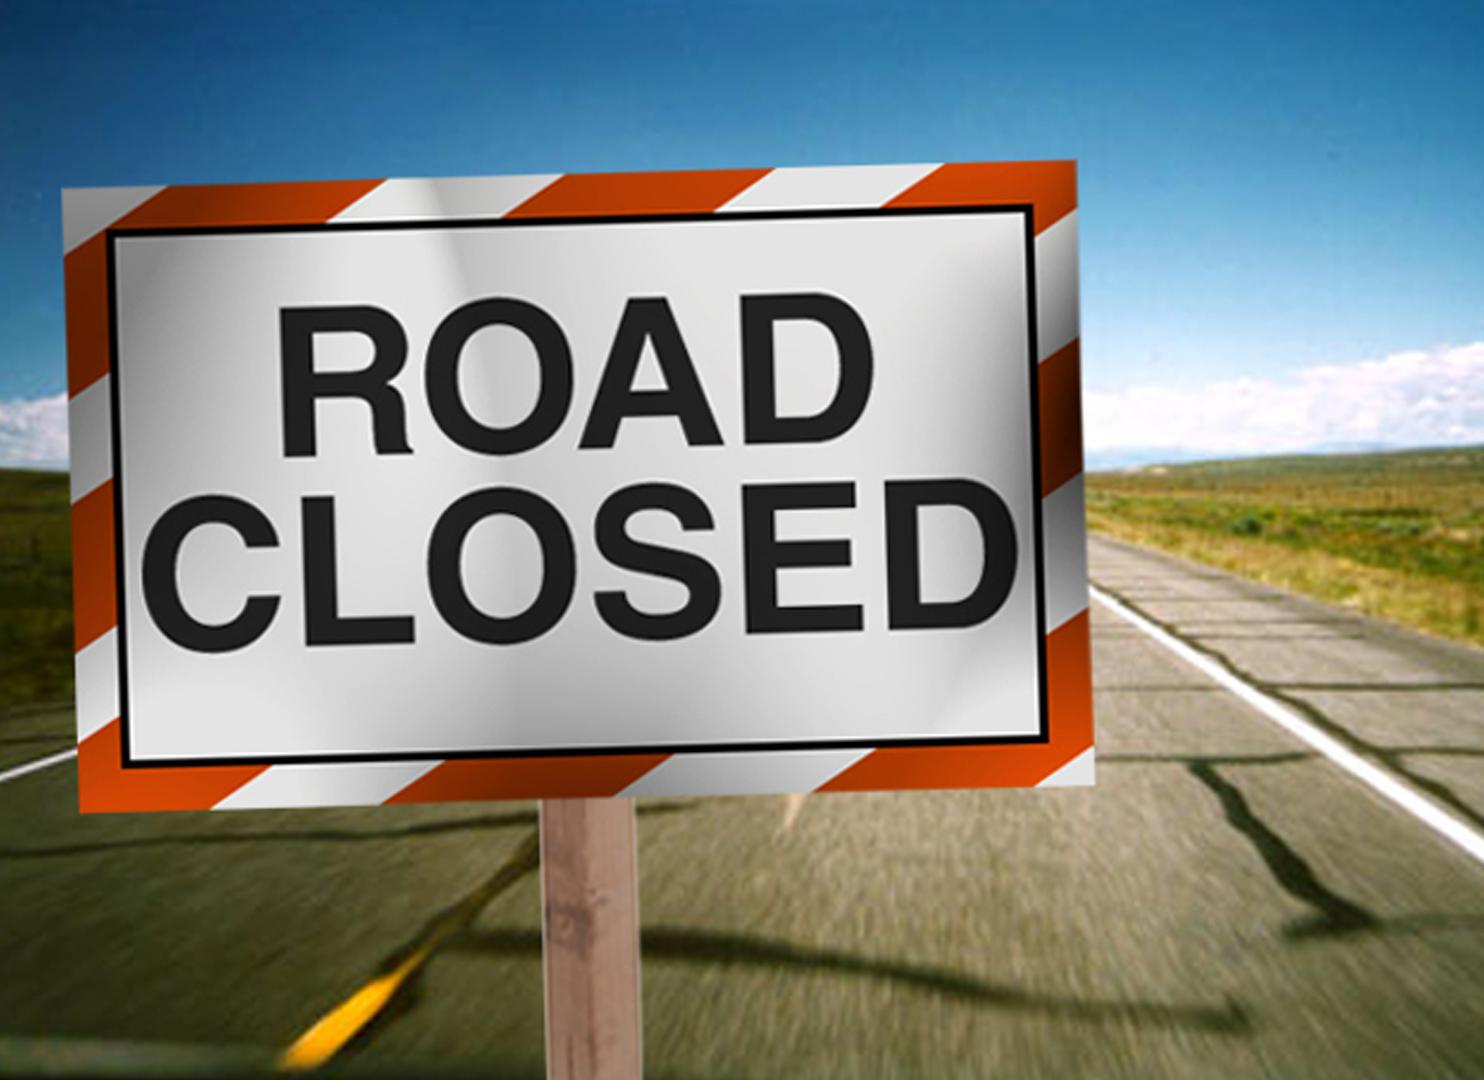 Road Closed_1470310601582.jpg